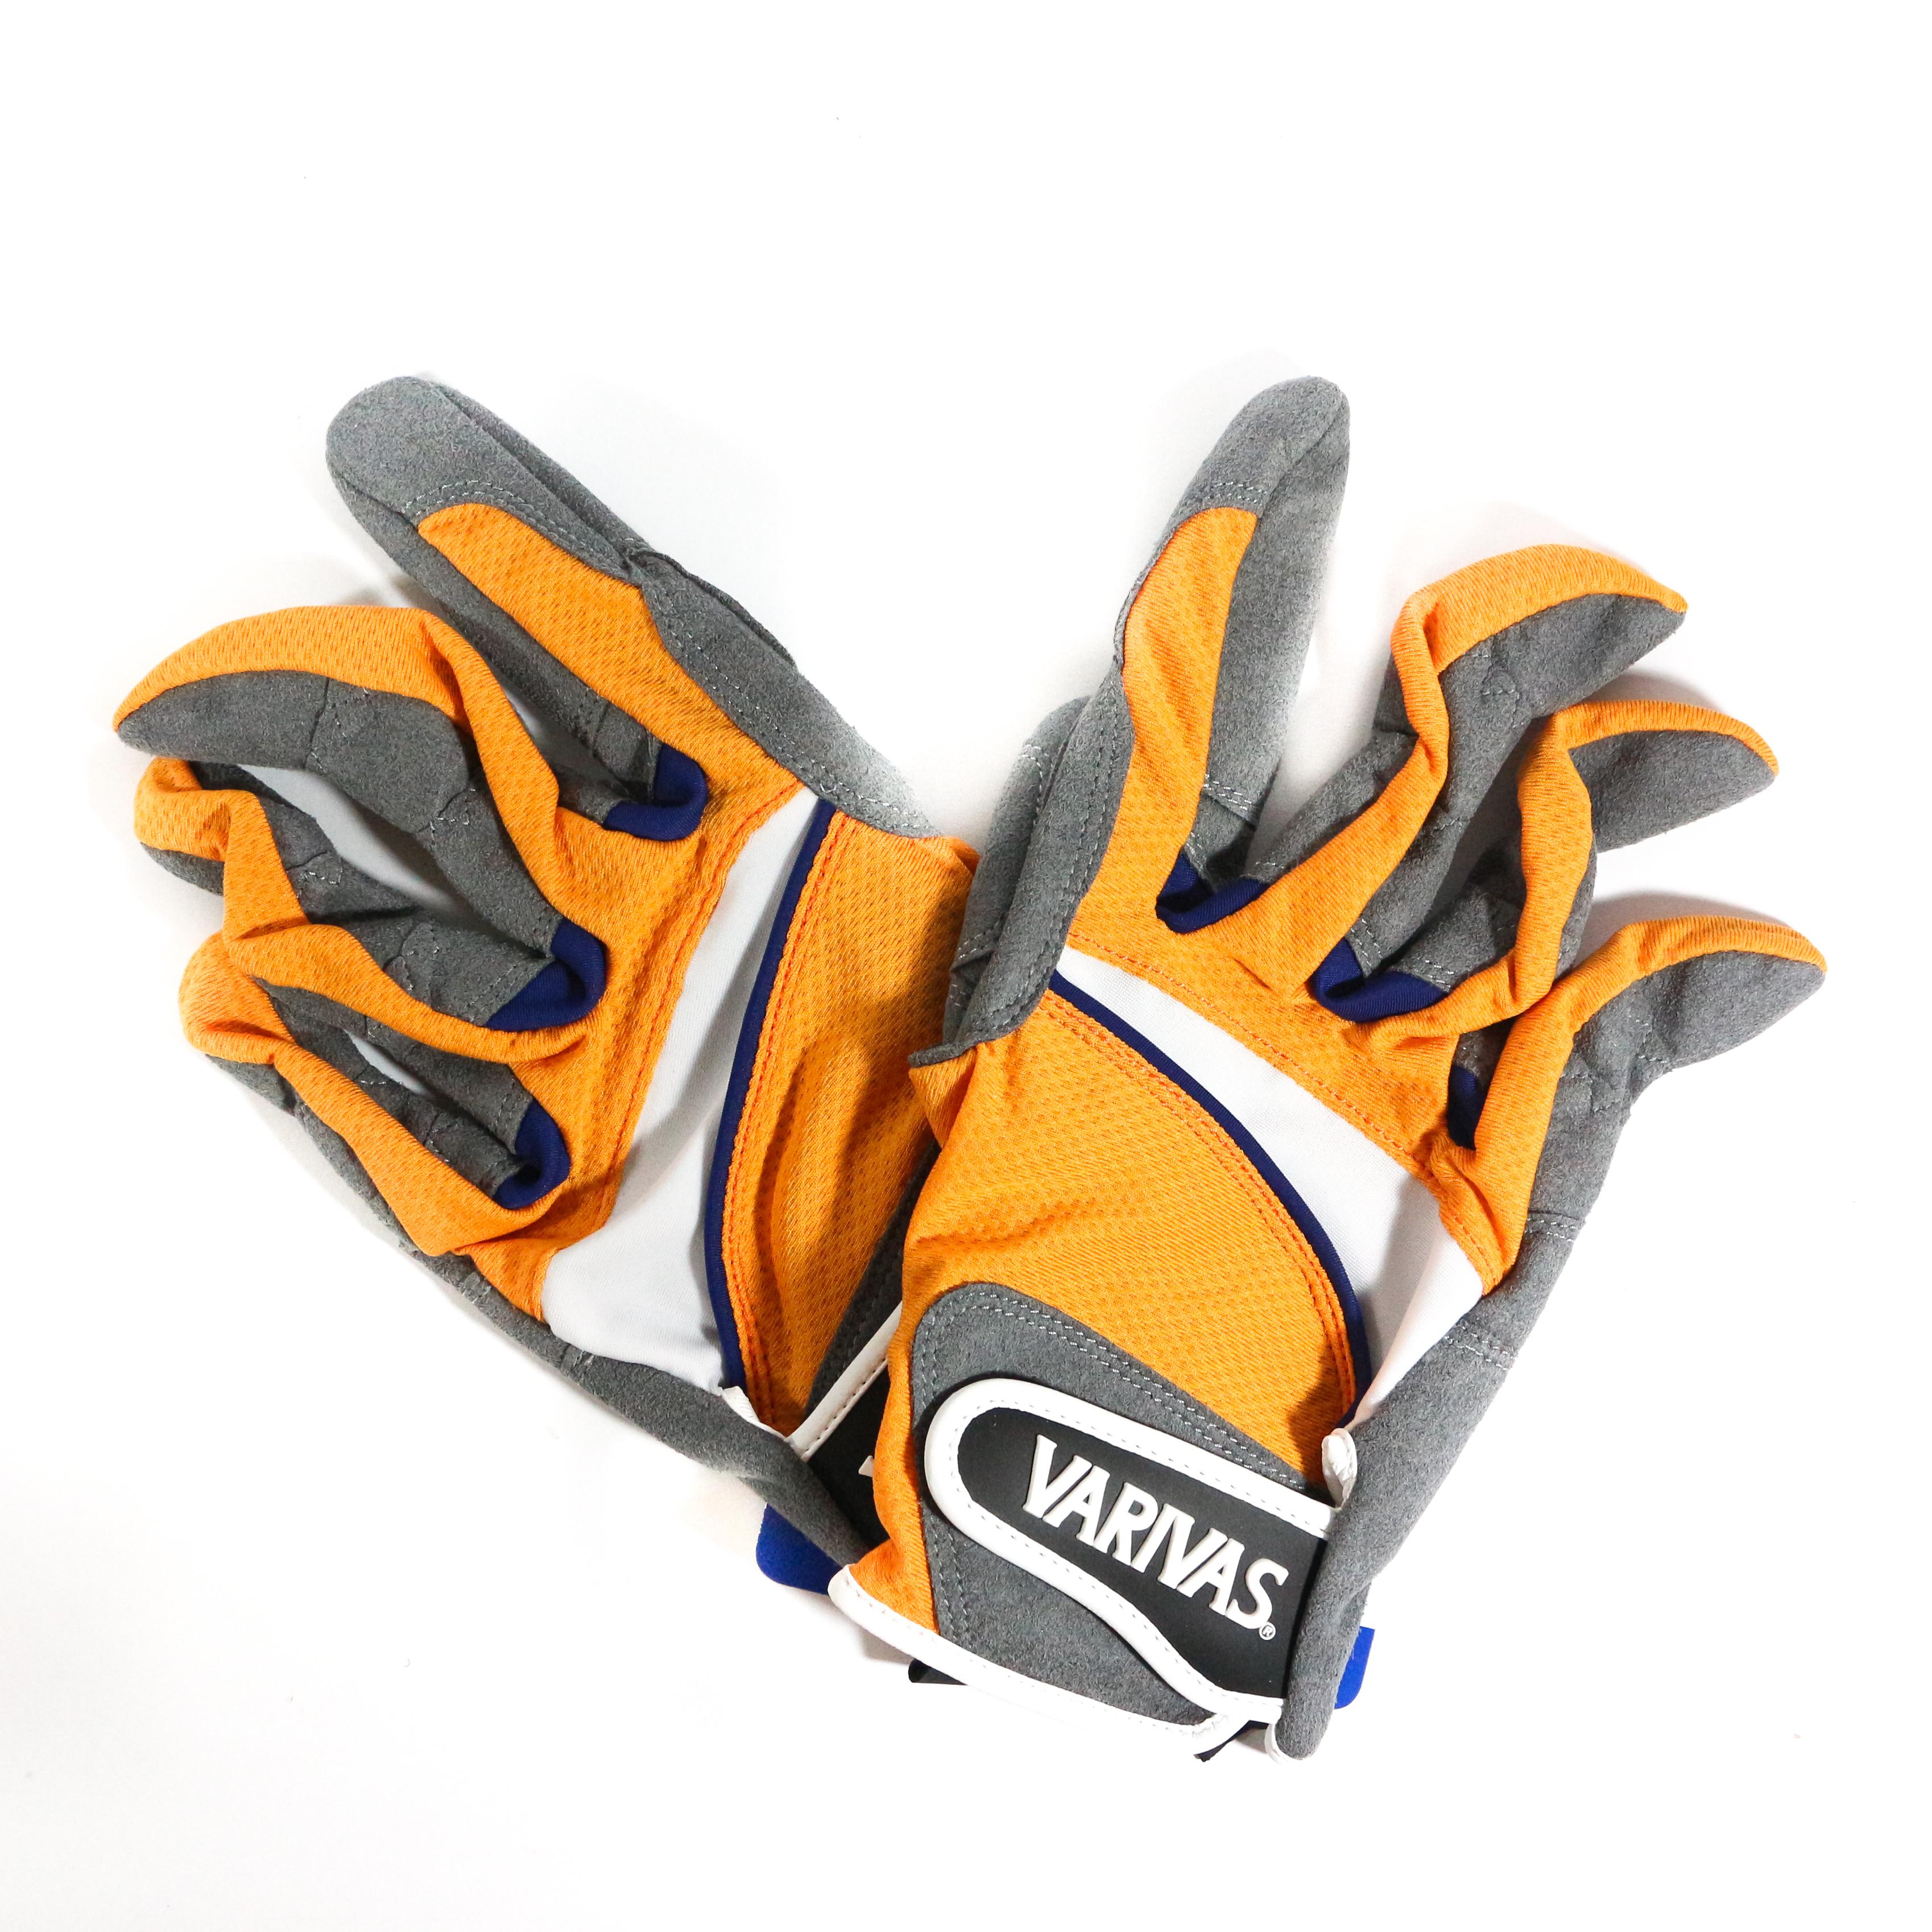 Varivas VAG-20 Mesh Gloves Ergo Grip Orange Size L (0566)